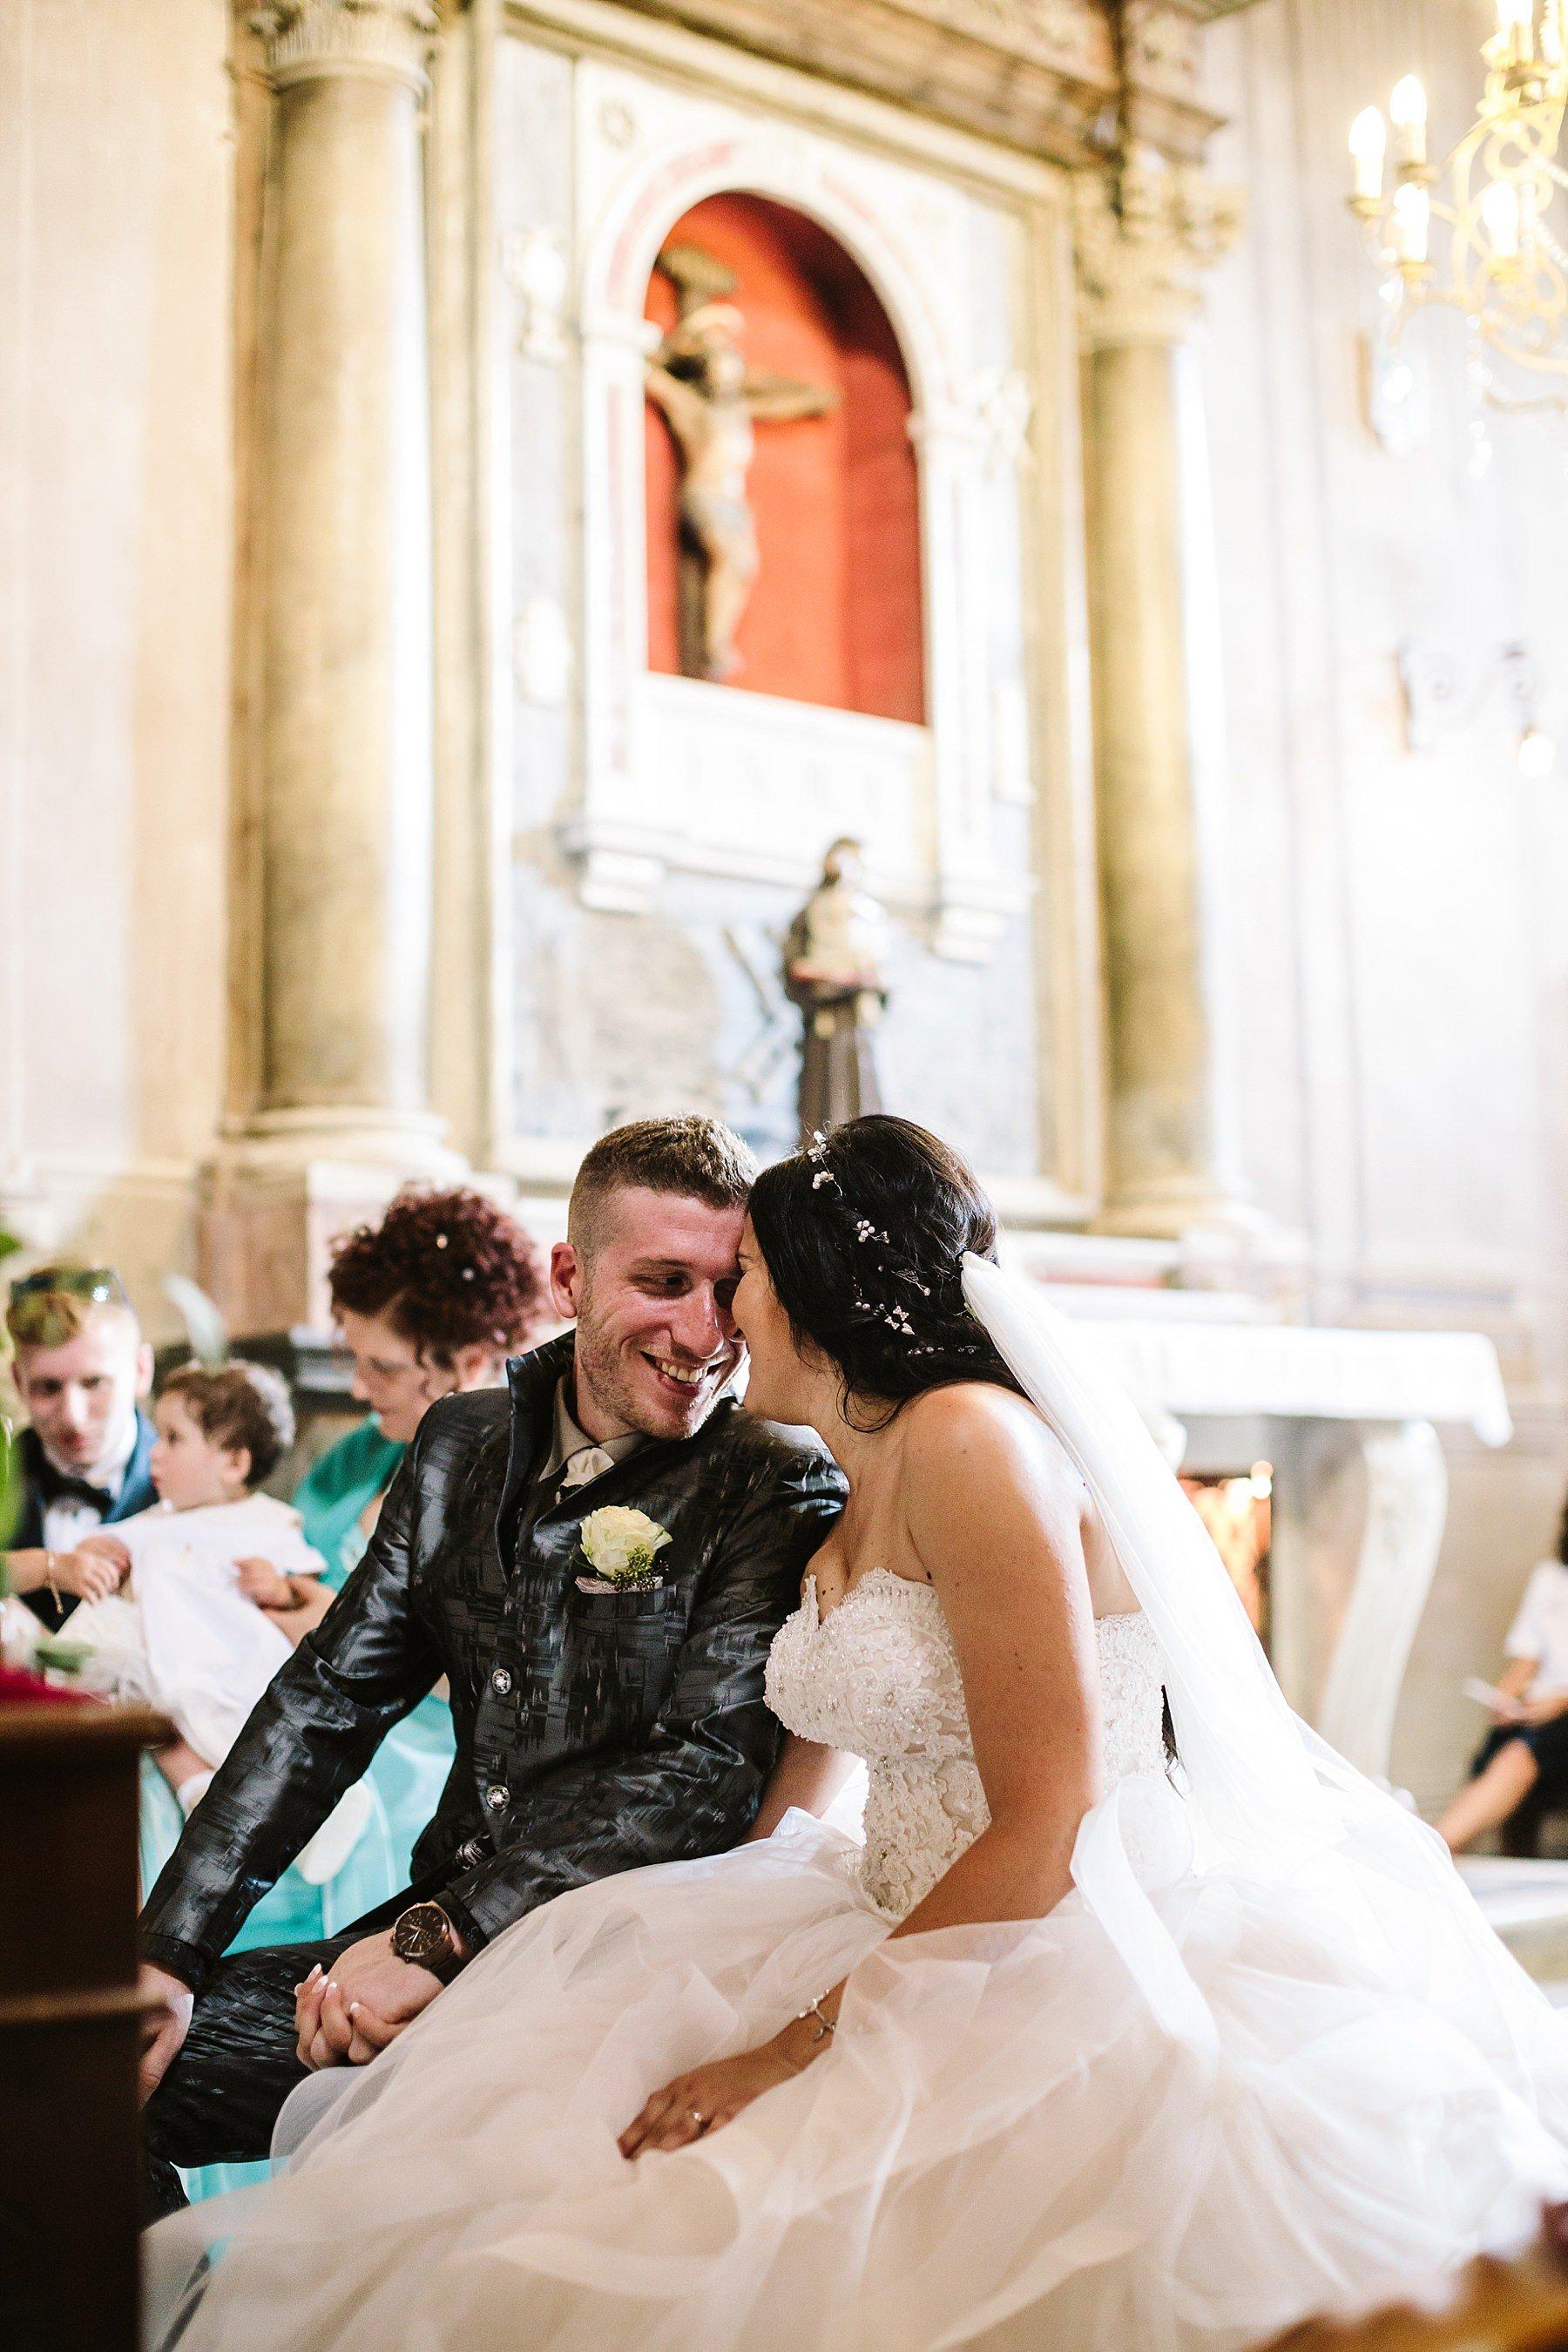 sposi durante la cerimonia nuziale